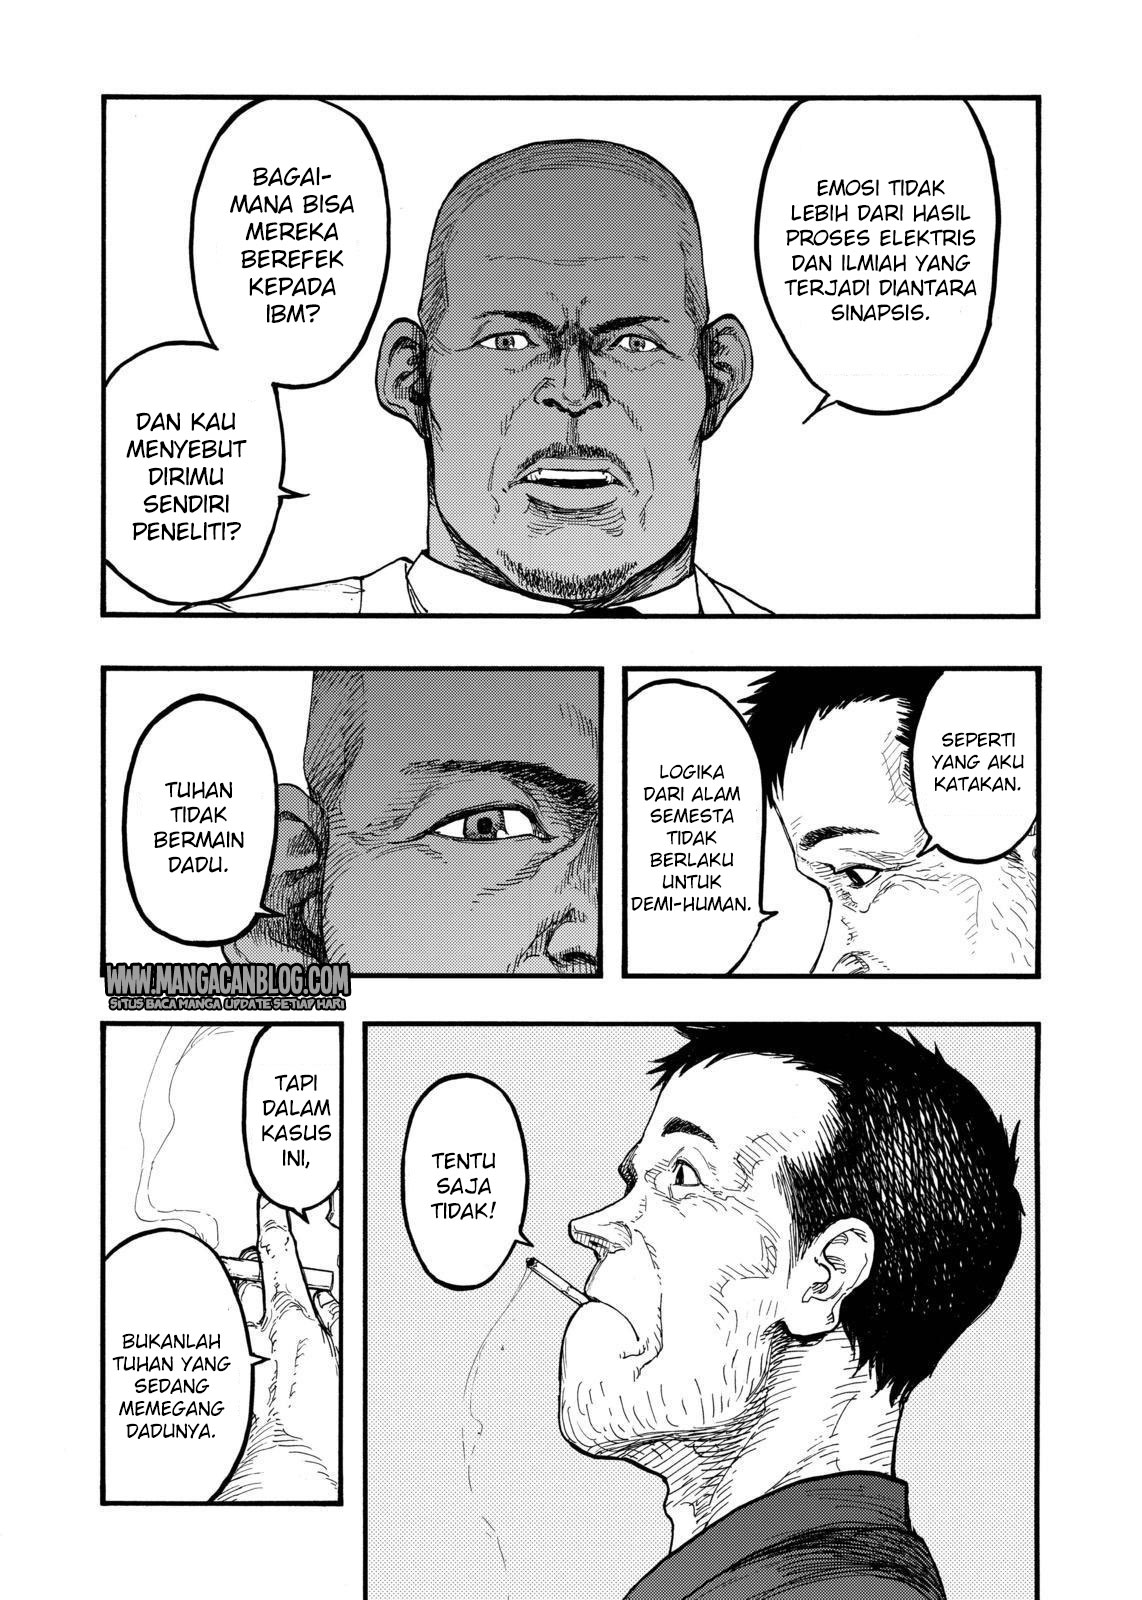 Dilarang COPAS - situs resmi www.mangacanblog.com - Komik ajin 046 - selamat pagi, sampai jumpa besok 47 Indonesia ajin 046 - selamat pagi, sampai jumpa besok Terbaru 27|Baca Manga Komik Indonesia|Mangacan